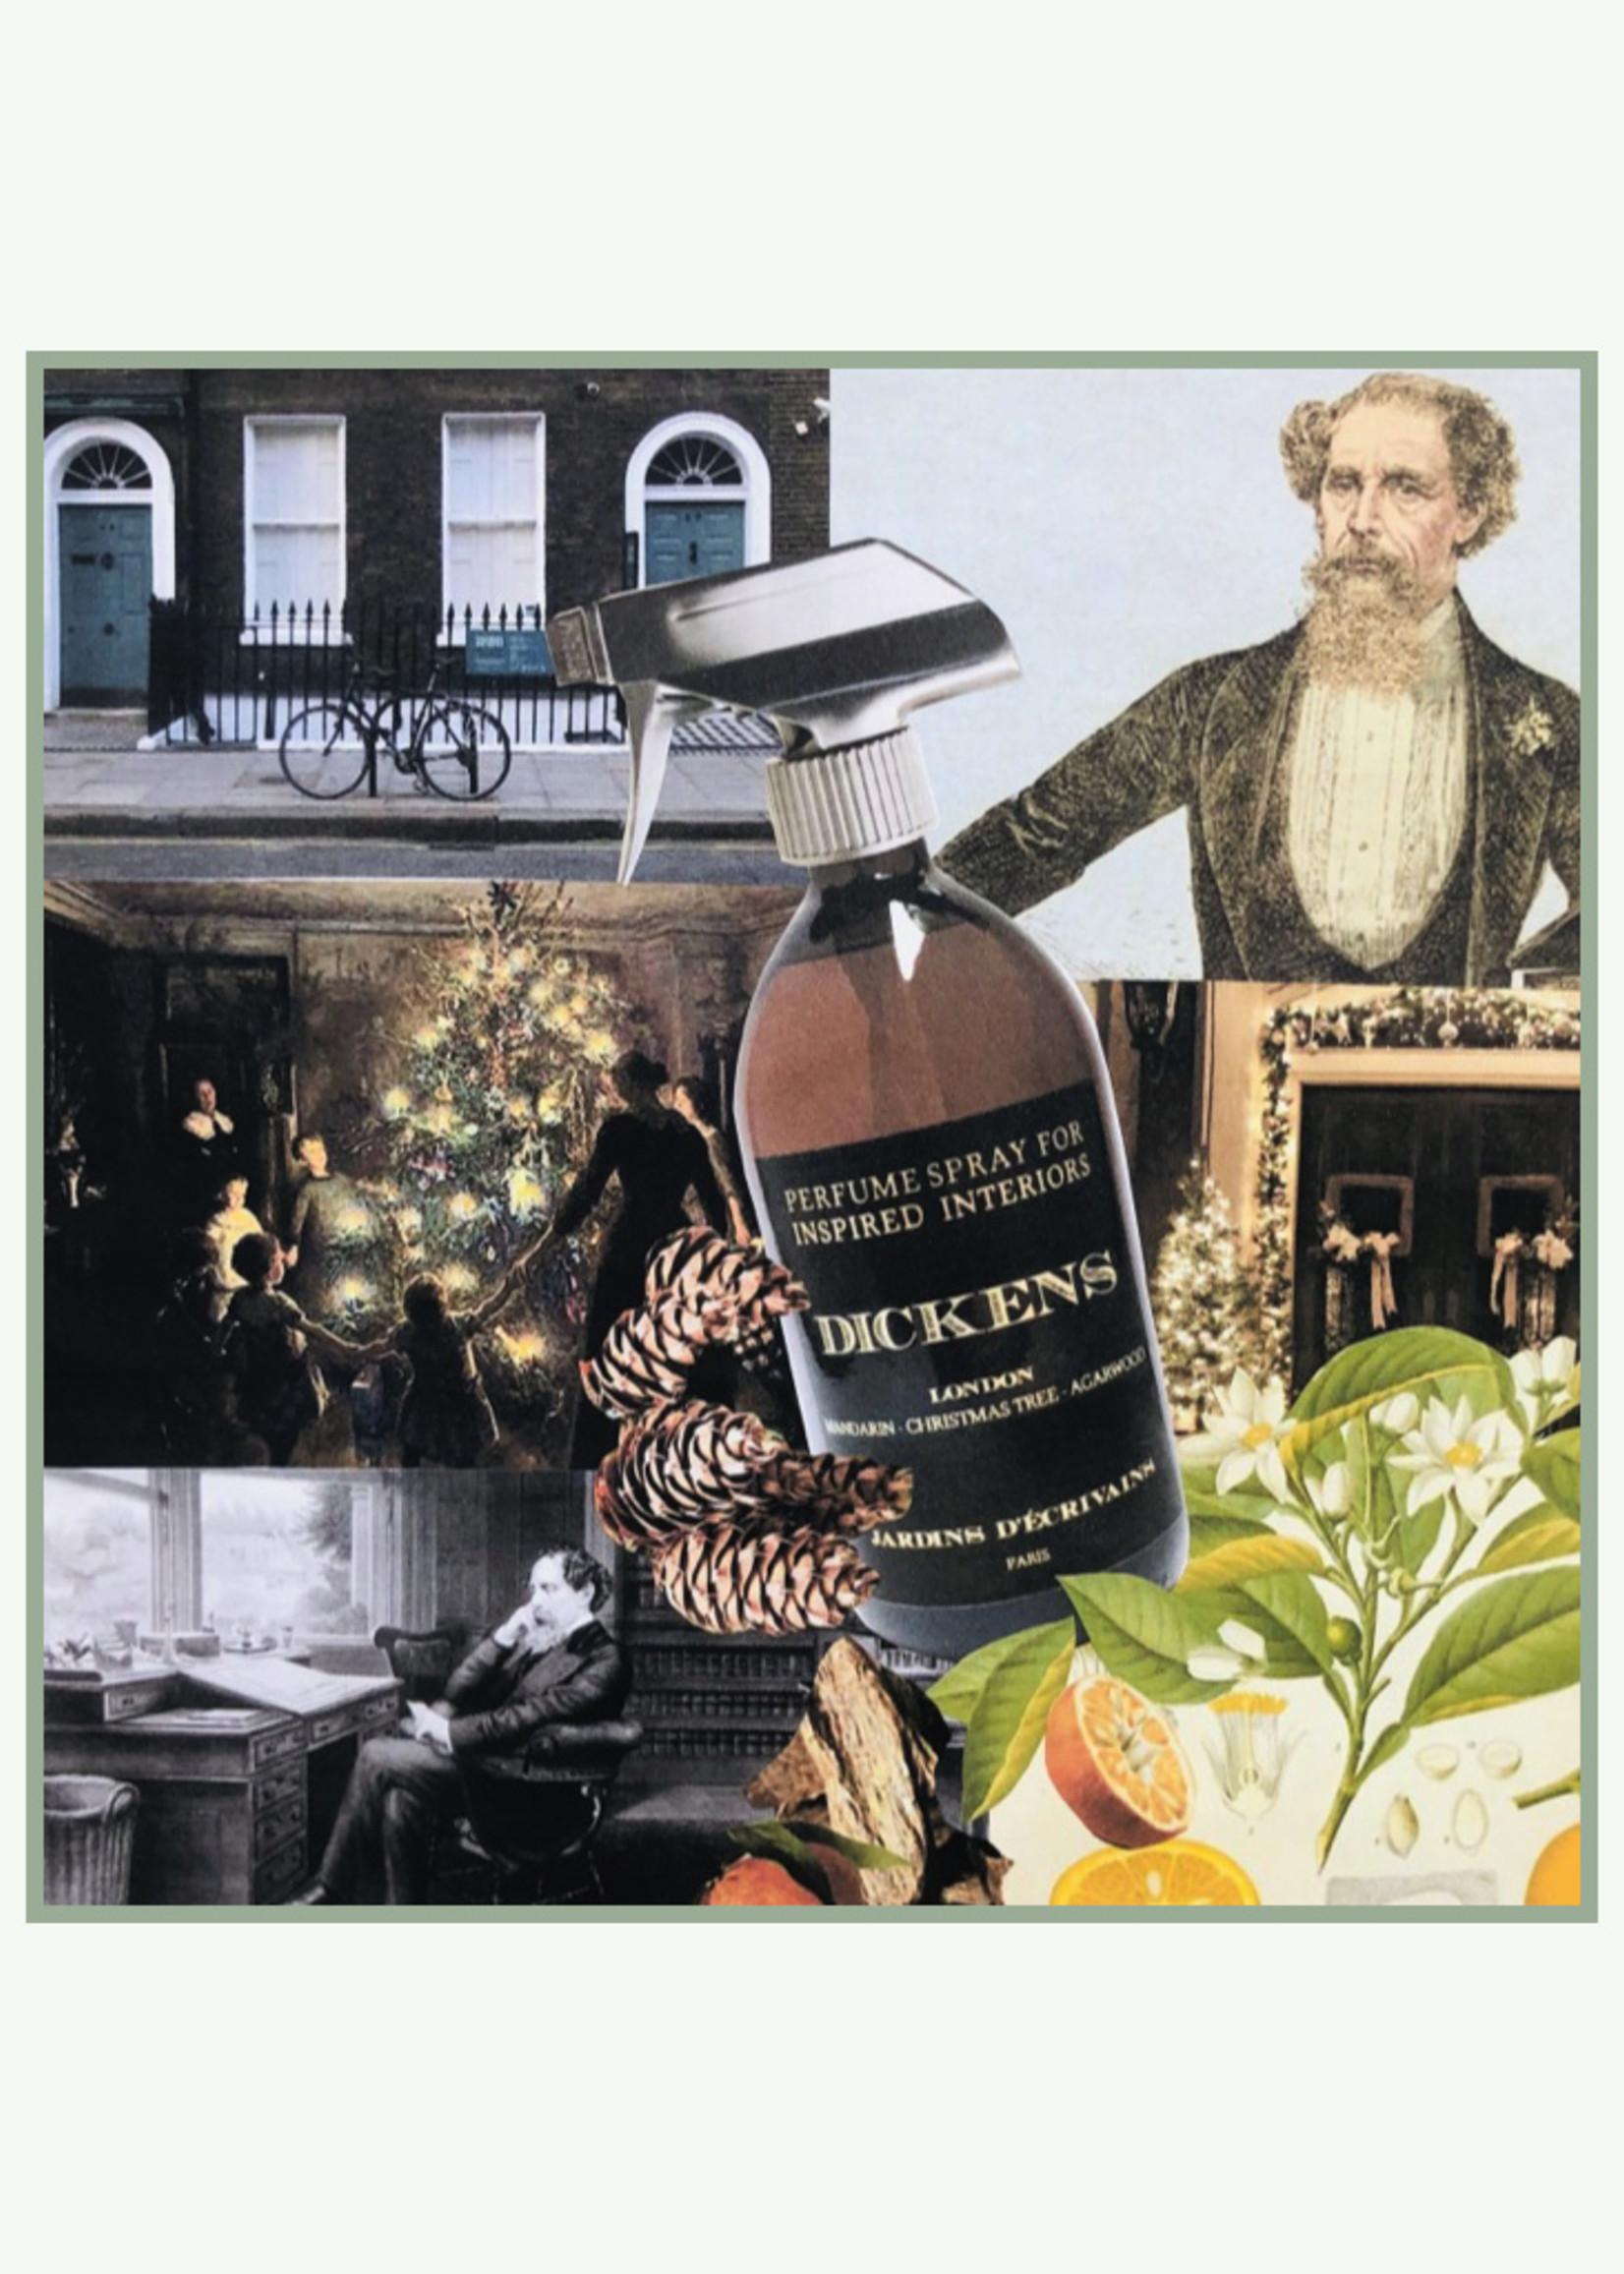 Jardins d'ecrivains Jardins d'écrivains - Dickens - Home spray